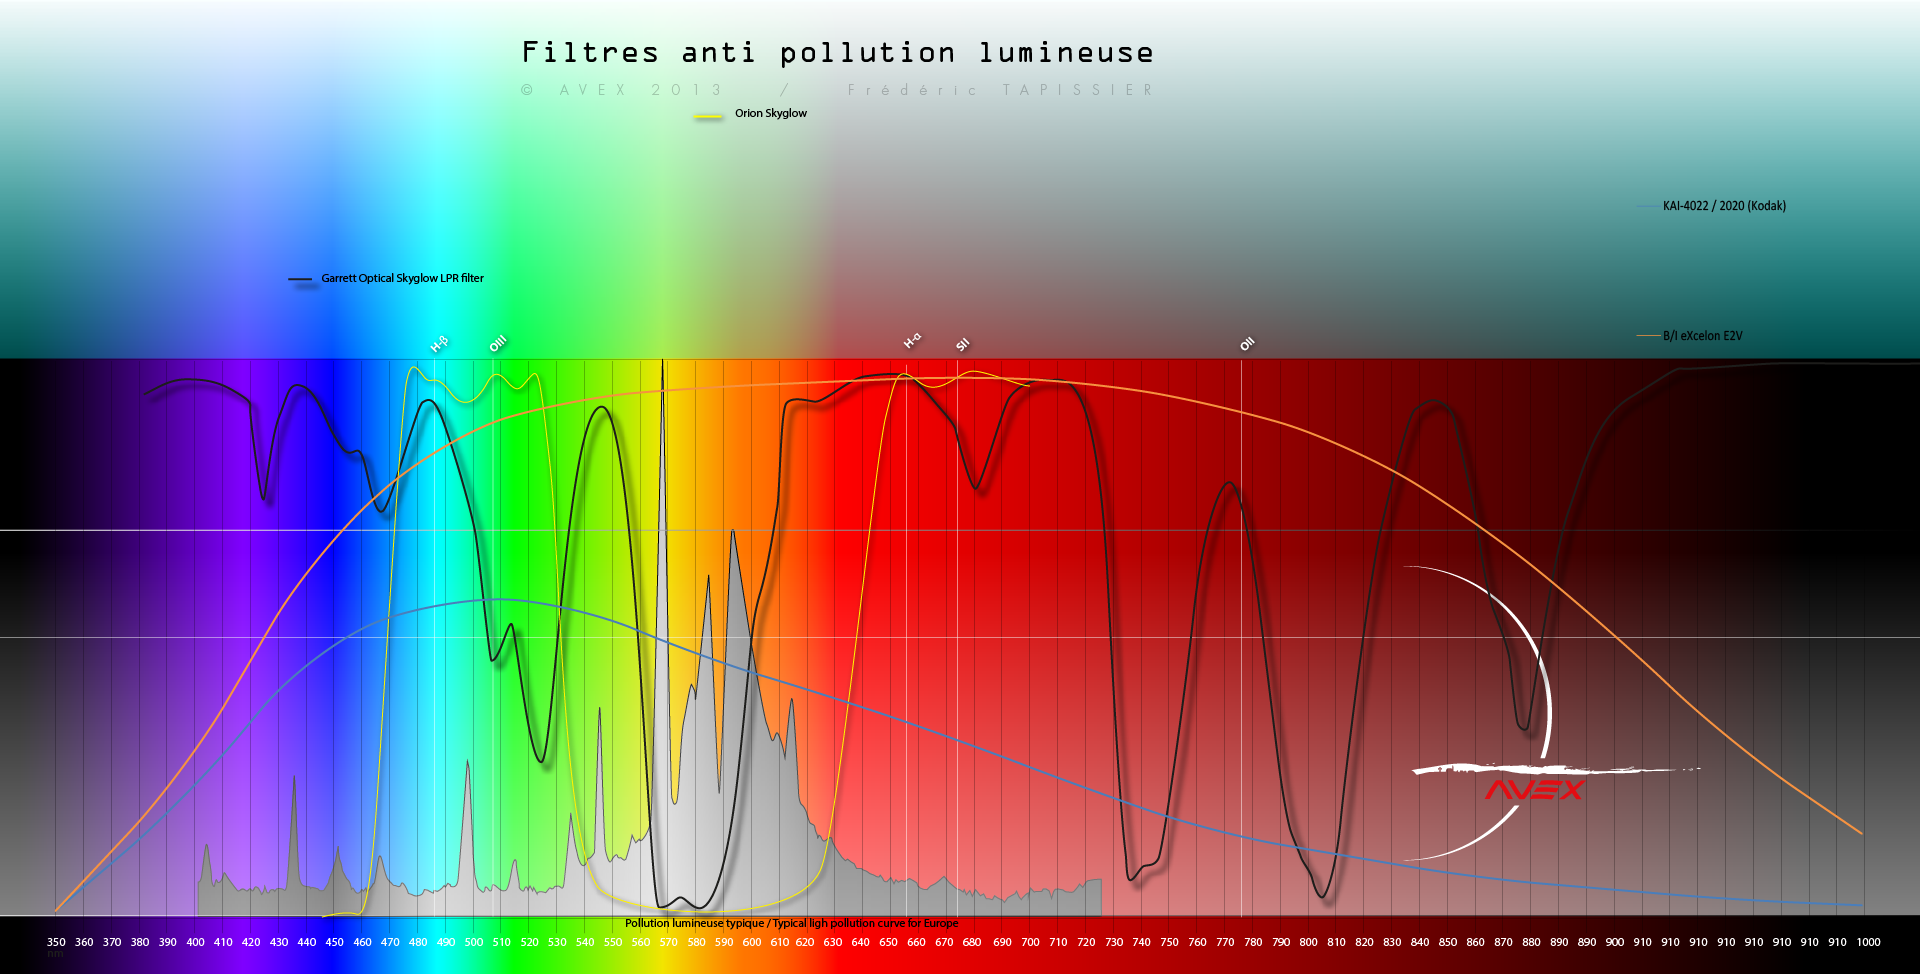 Filtre anti-pollution IDAS-LPS-D1 904220spectrefiltreavex4